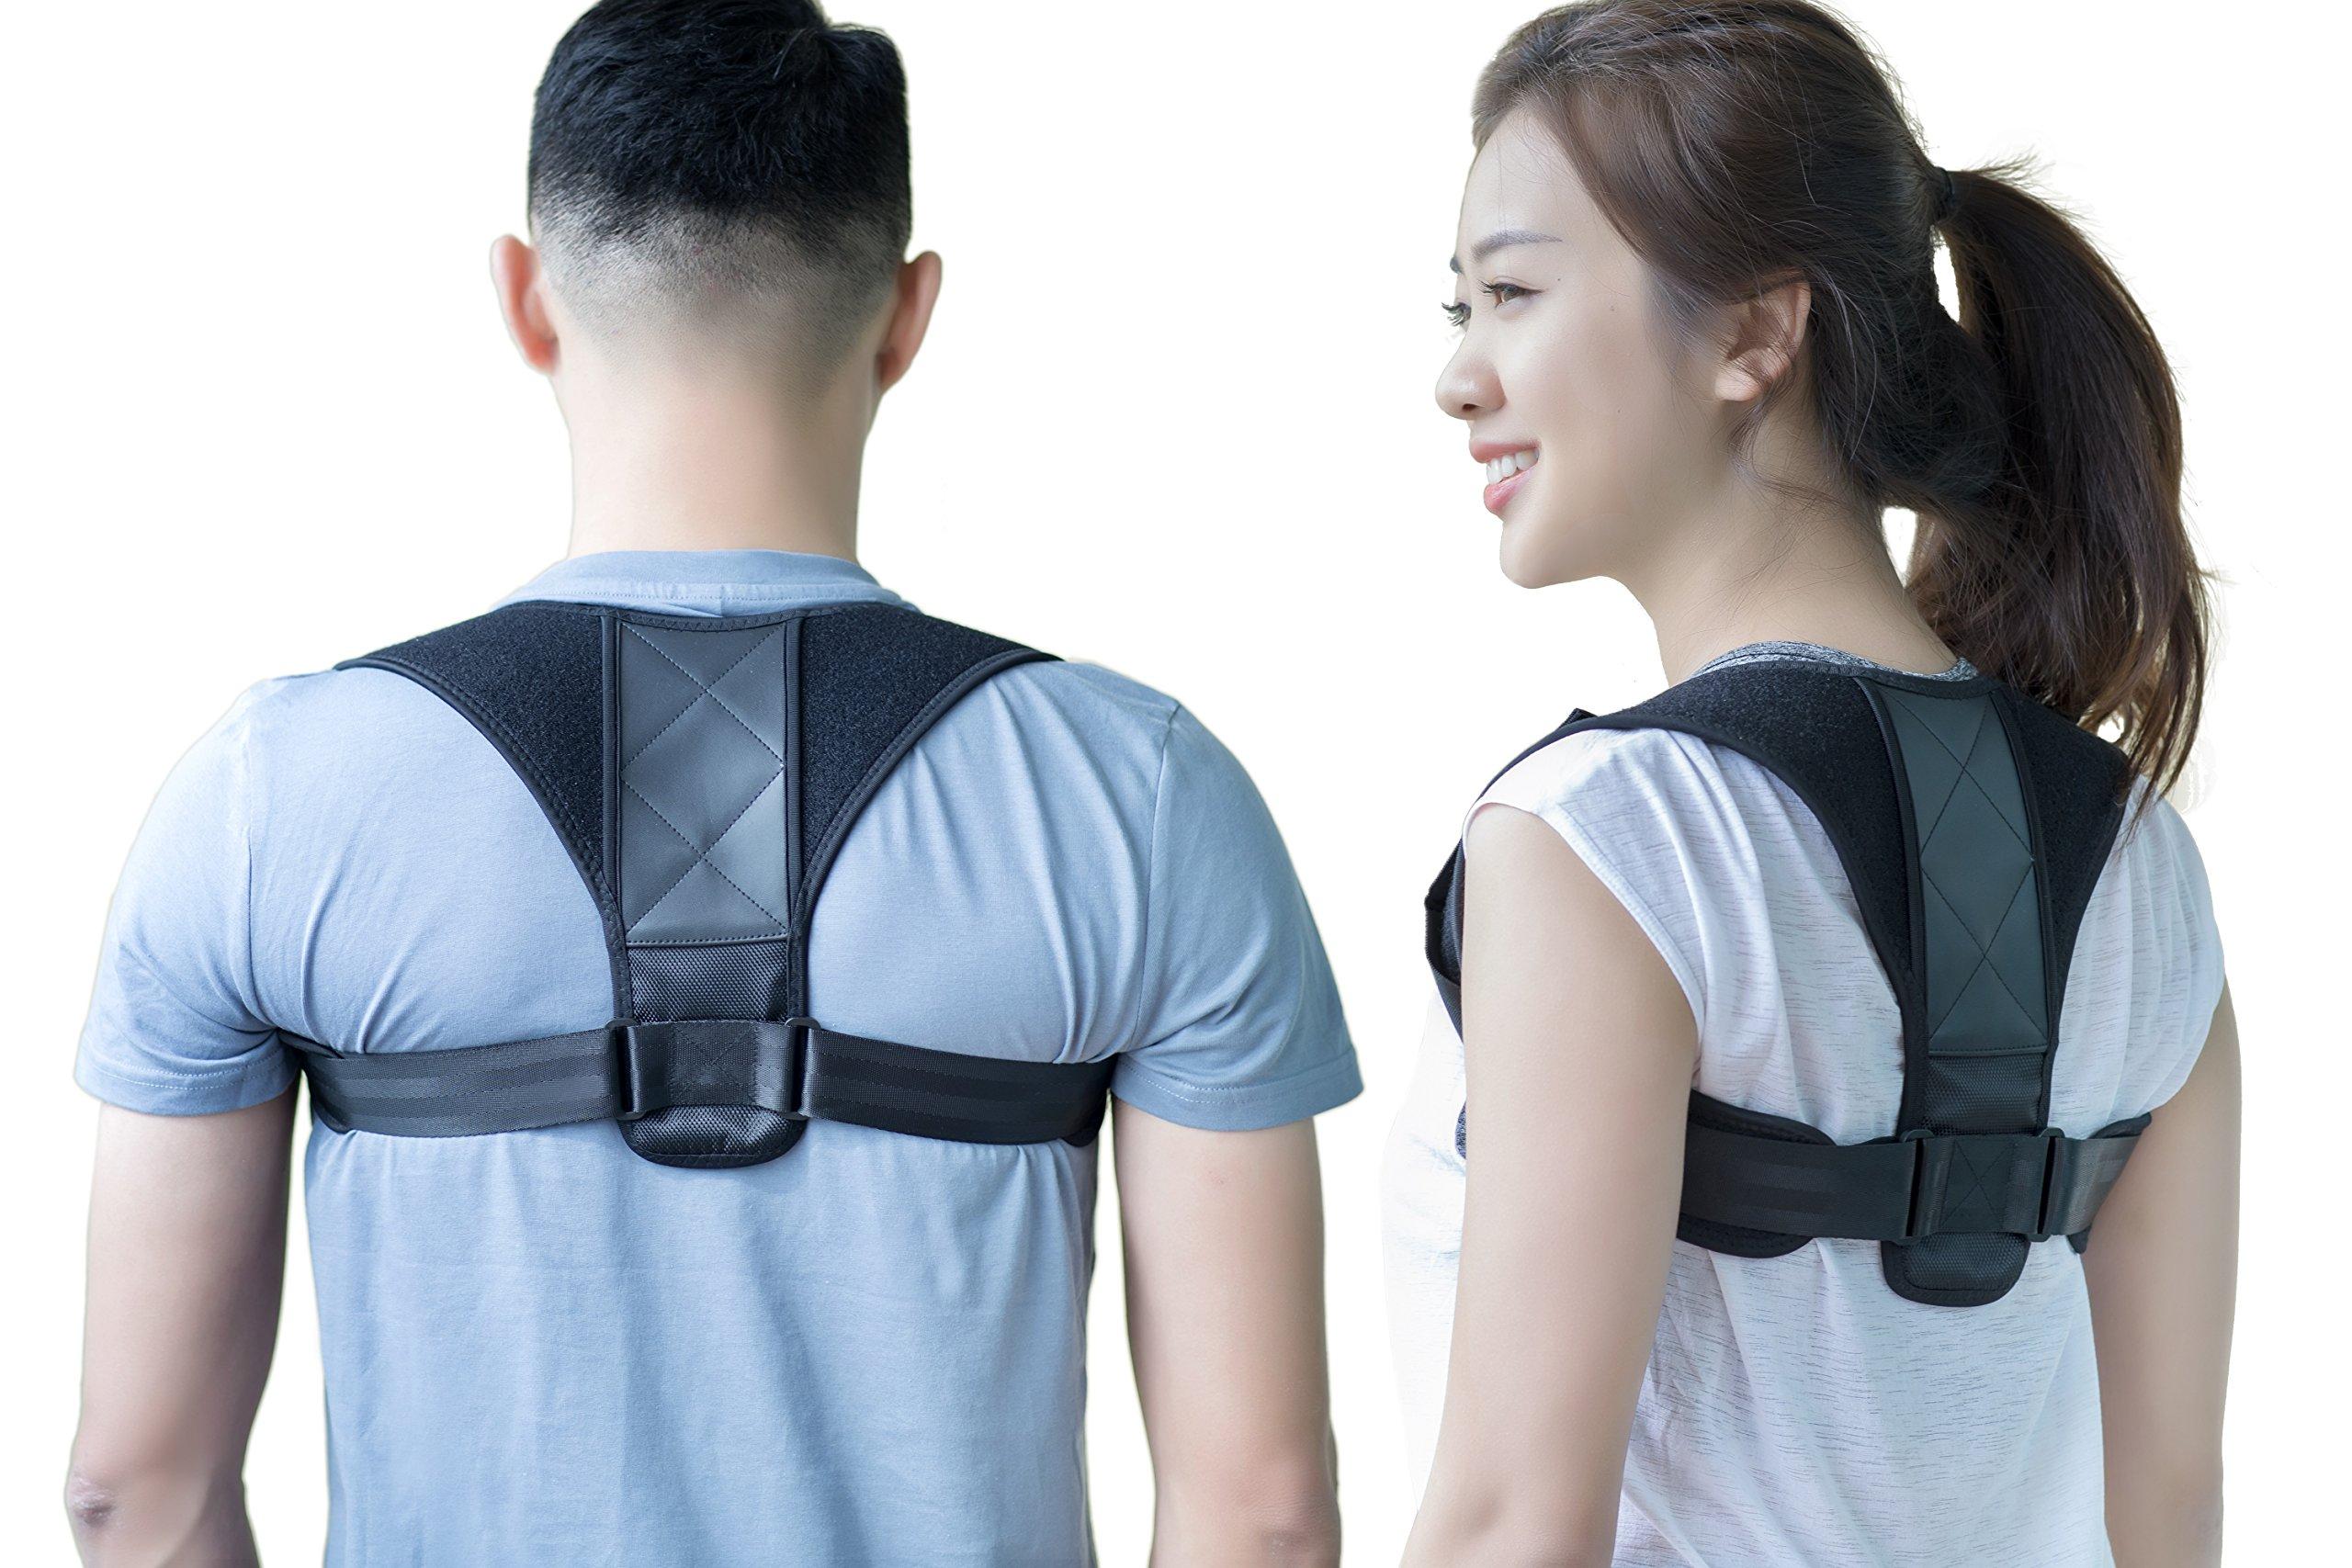 Back Brace Posture Corrector   Posture Support for Chest, Upper Back & Shoulder – Improve Posture & Neck Pain Relief   Comfortable & Breathable Neoprene by Manrover (REG (28''-43'' Chest))